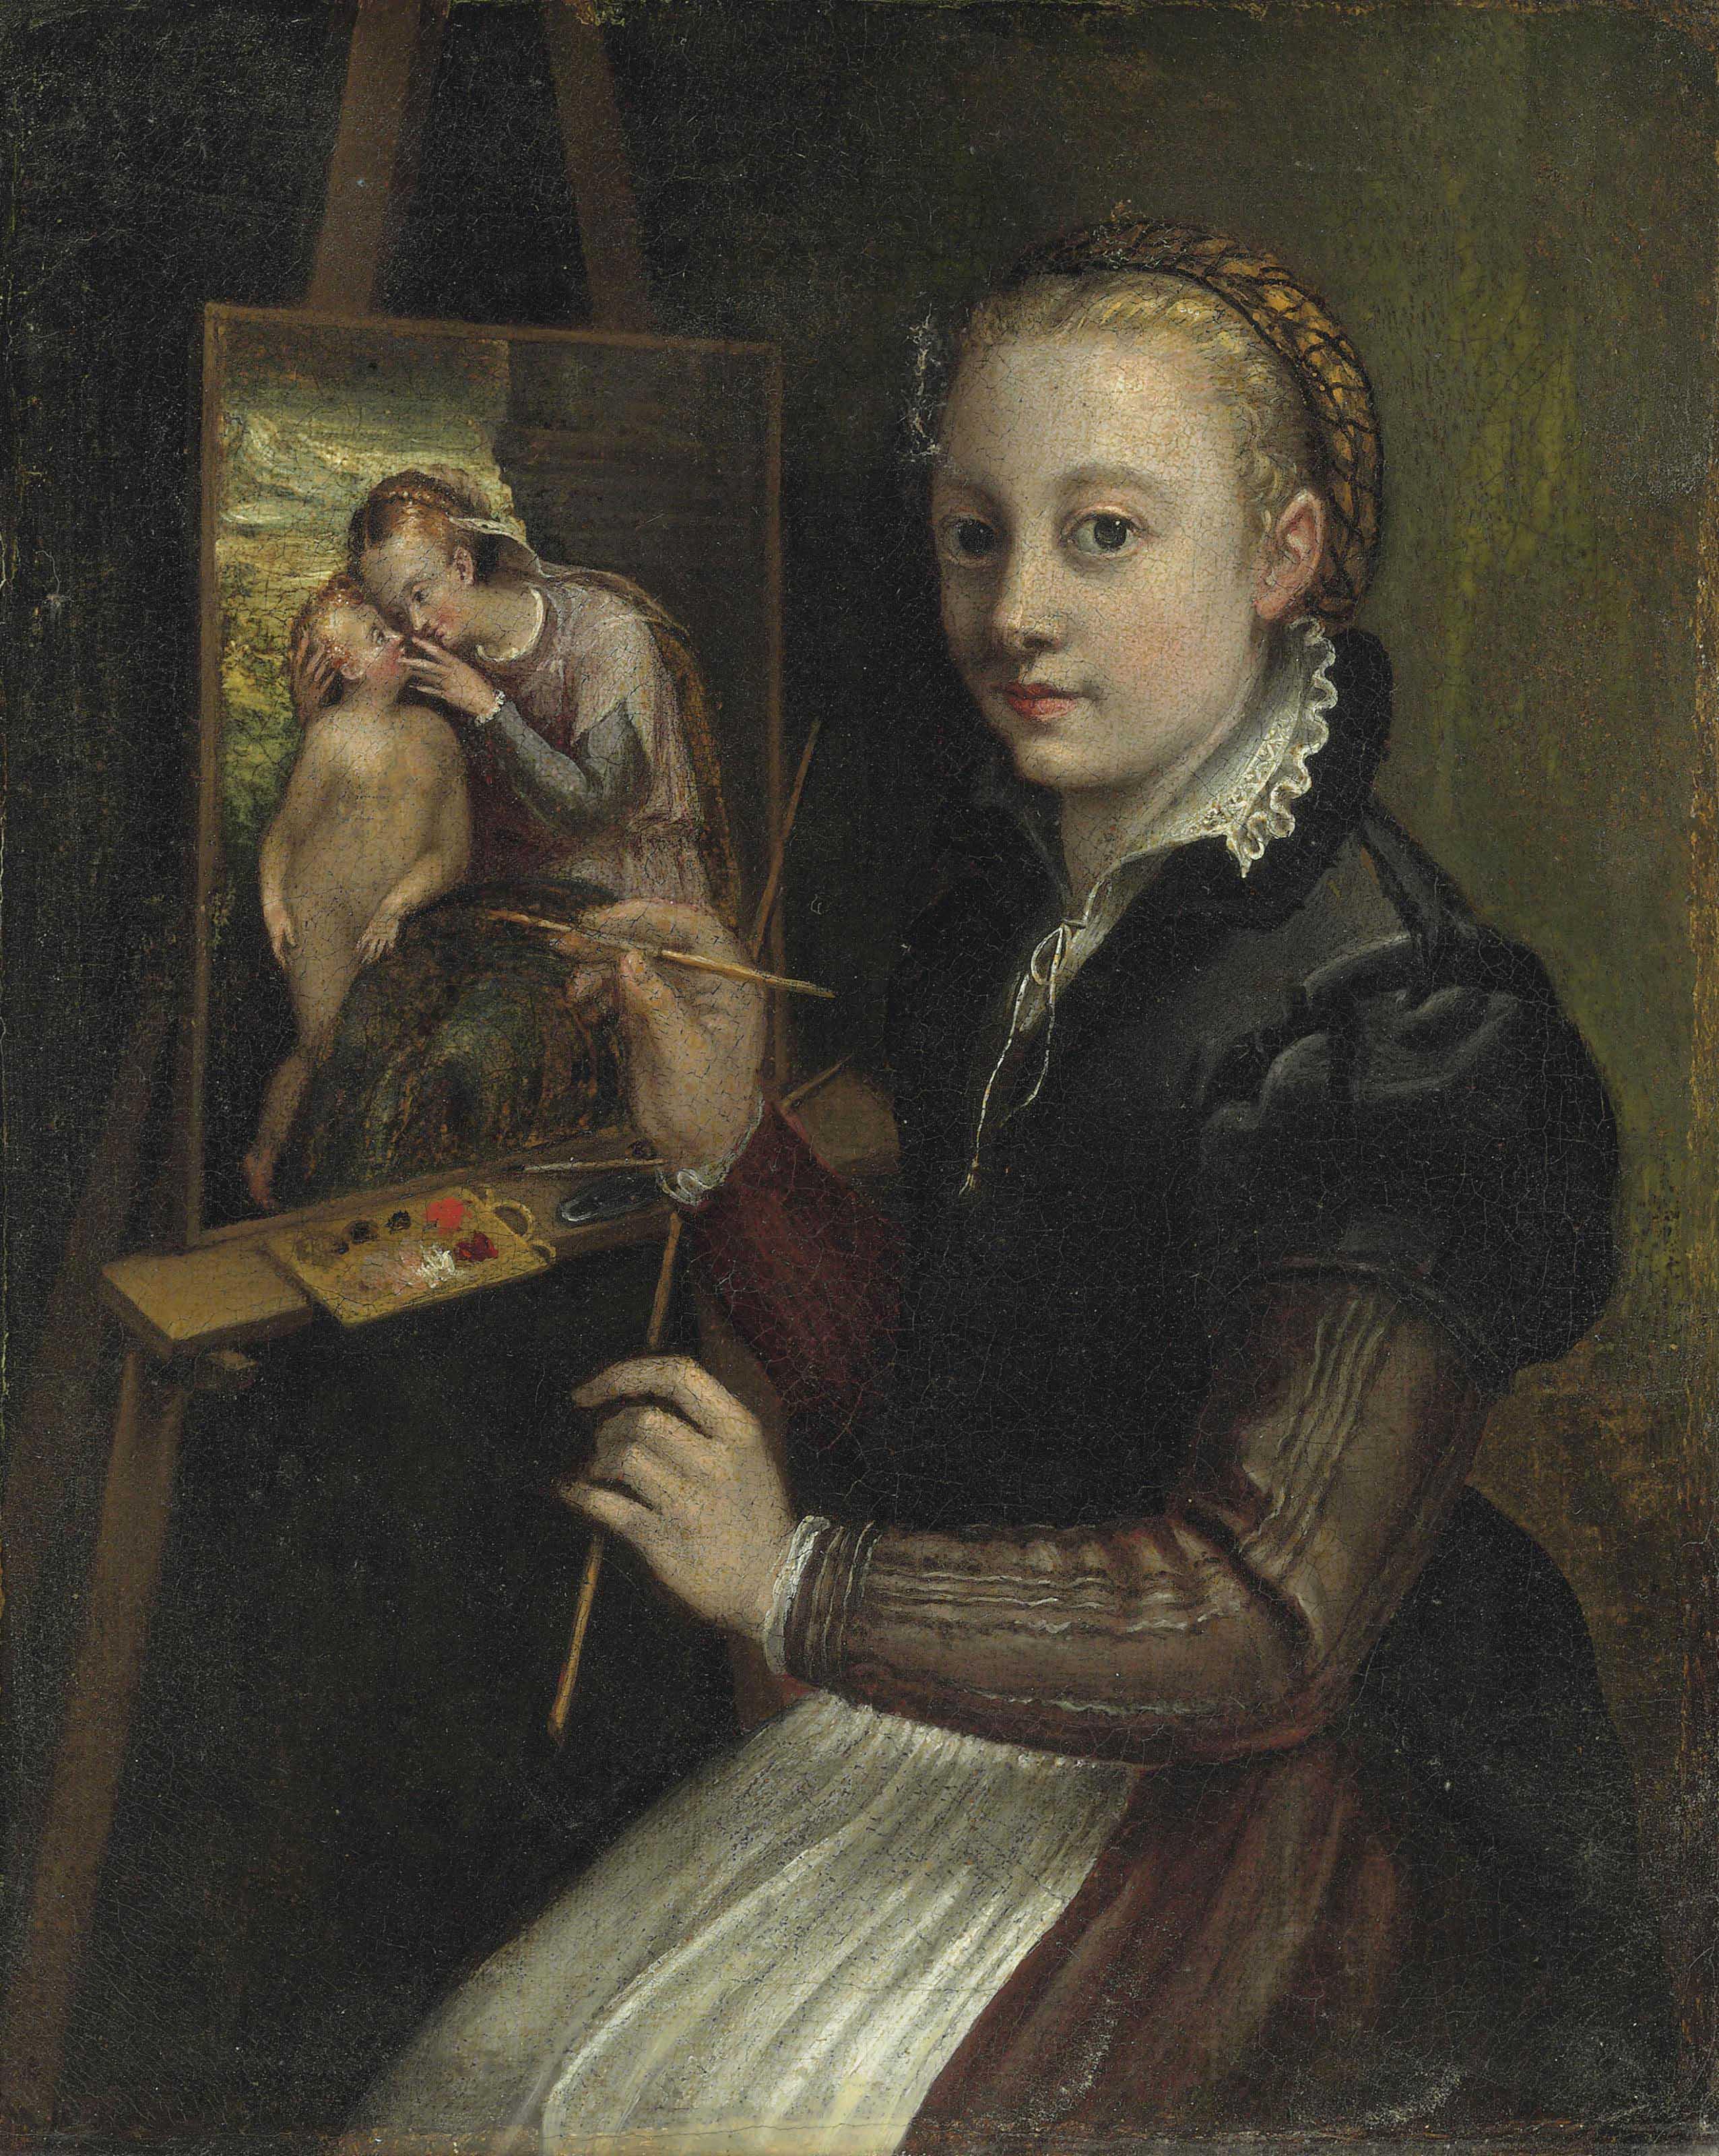 Attributed to Sofonisba Anguissola (Cremona c. 1532-1625 Palermo)